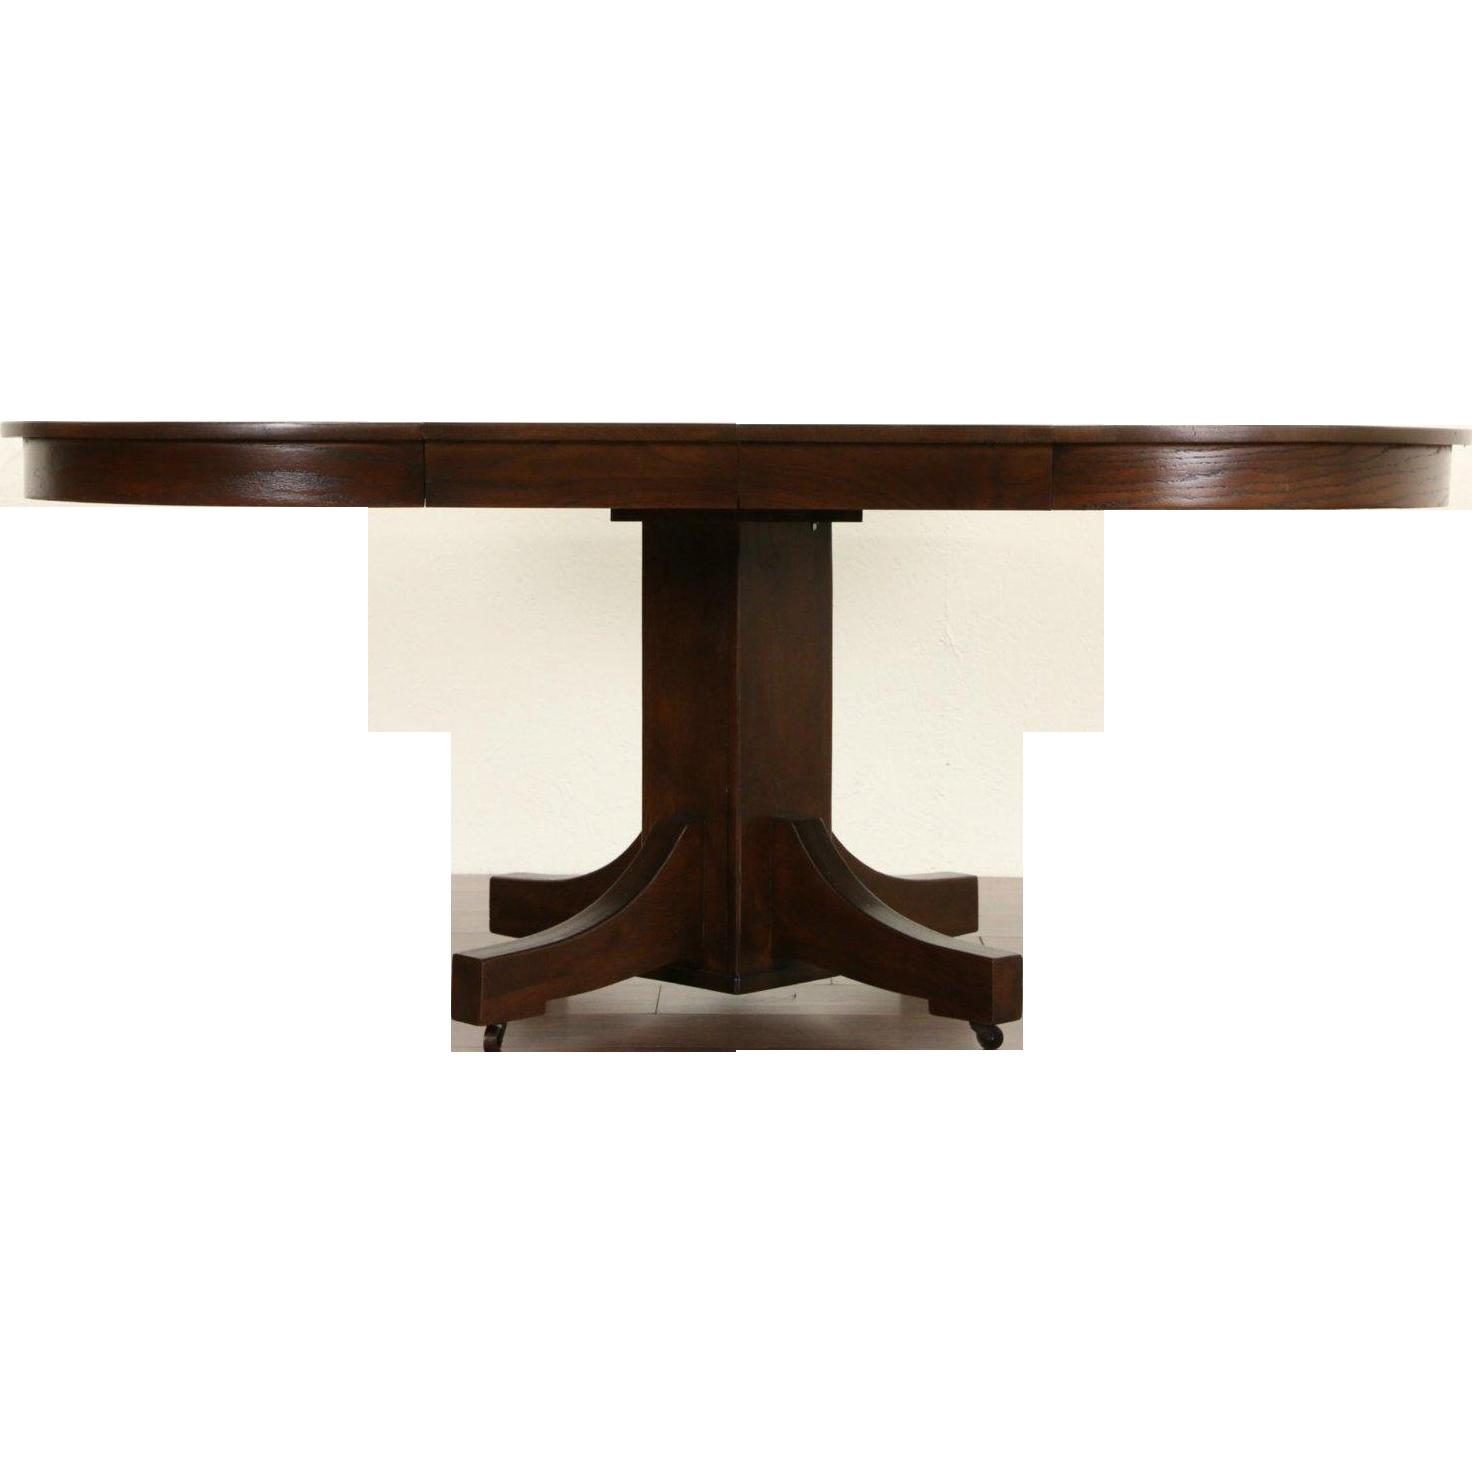 Arts & Crafts Mission Oak Round 1910 Antique Craftsman Dining Table, 2 Leaves